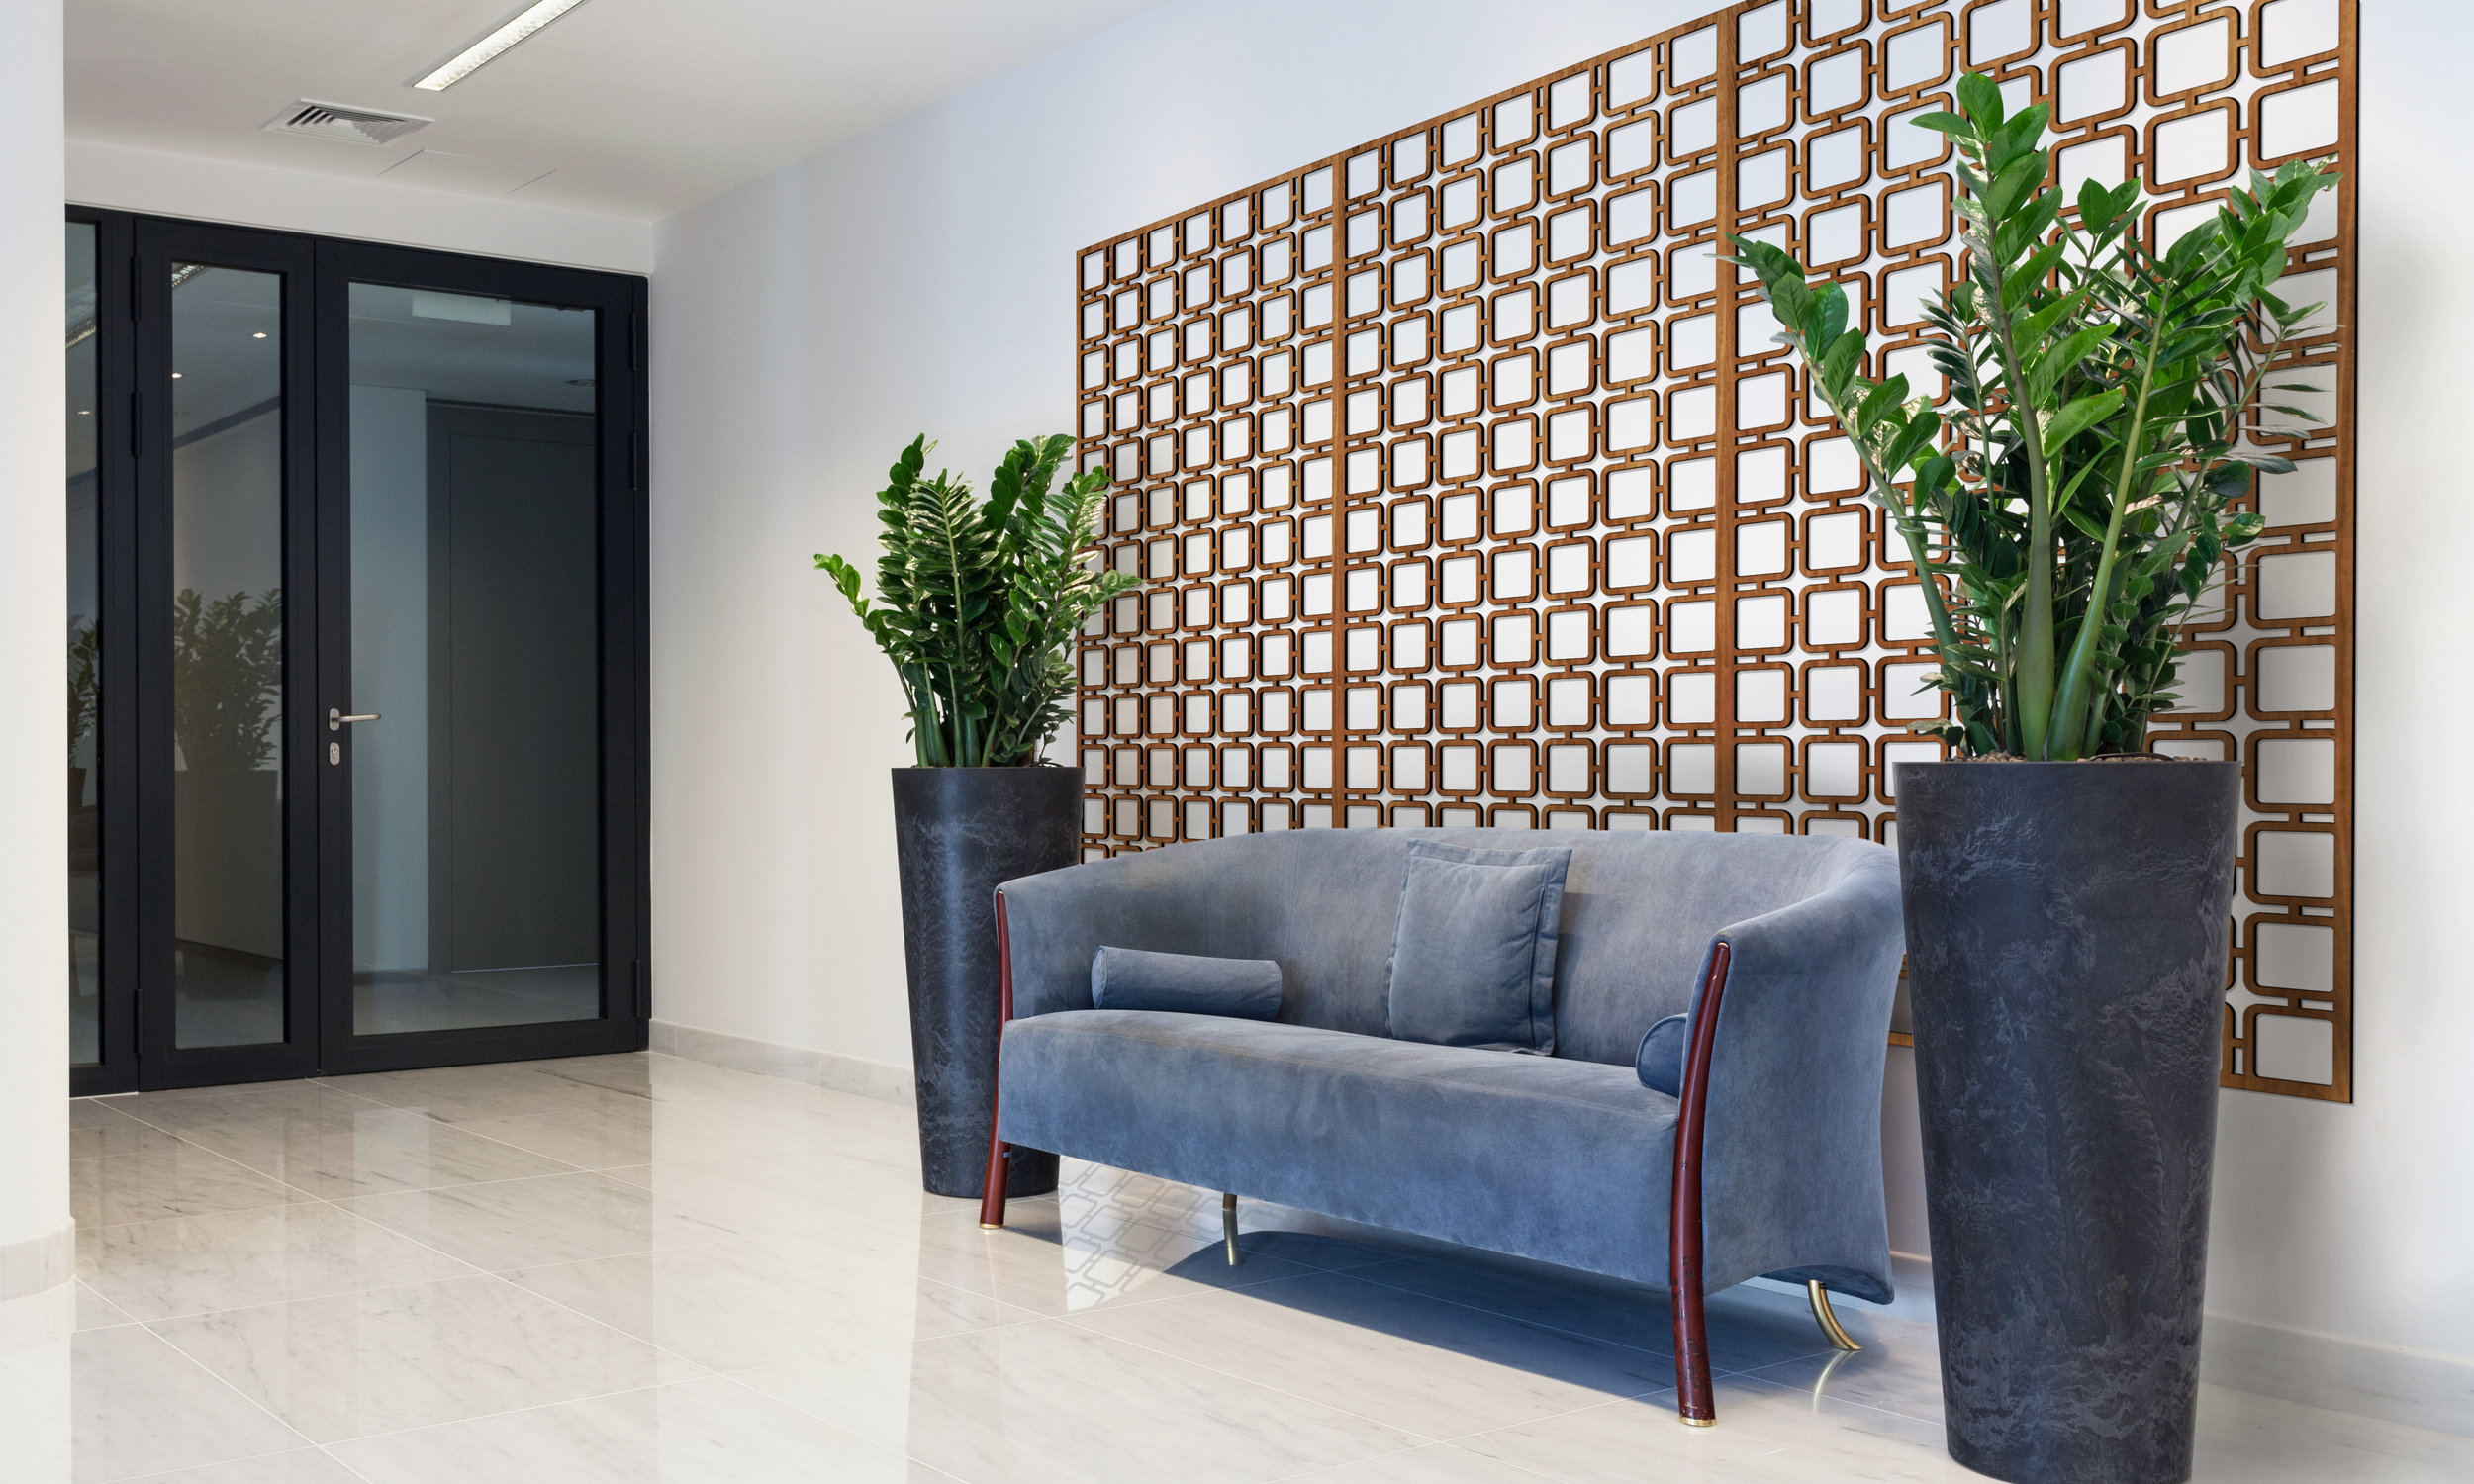 Installation Rendering A   Square Mezzo decorative office wall panel - shown in Cherry